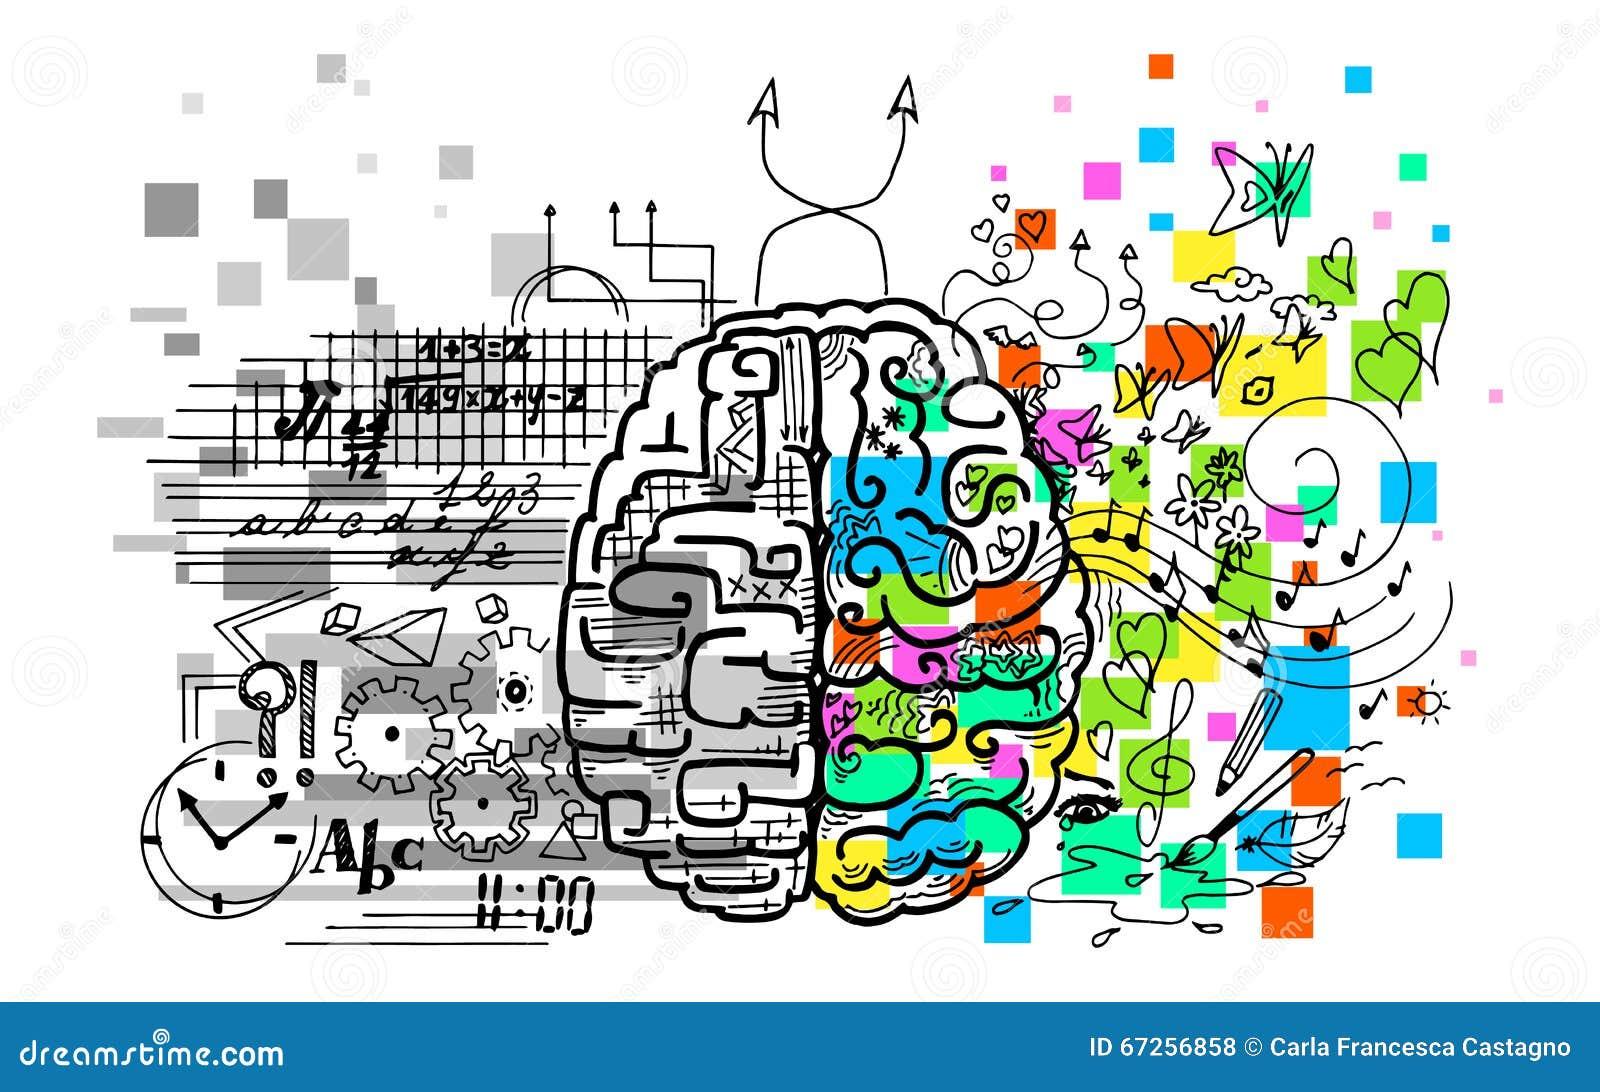 Gehirnhemisphären